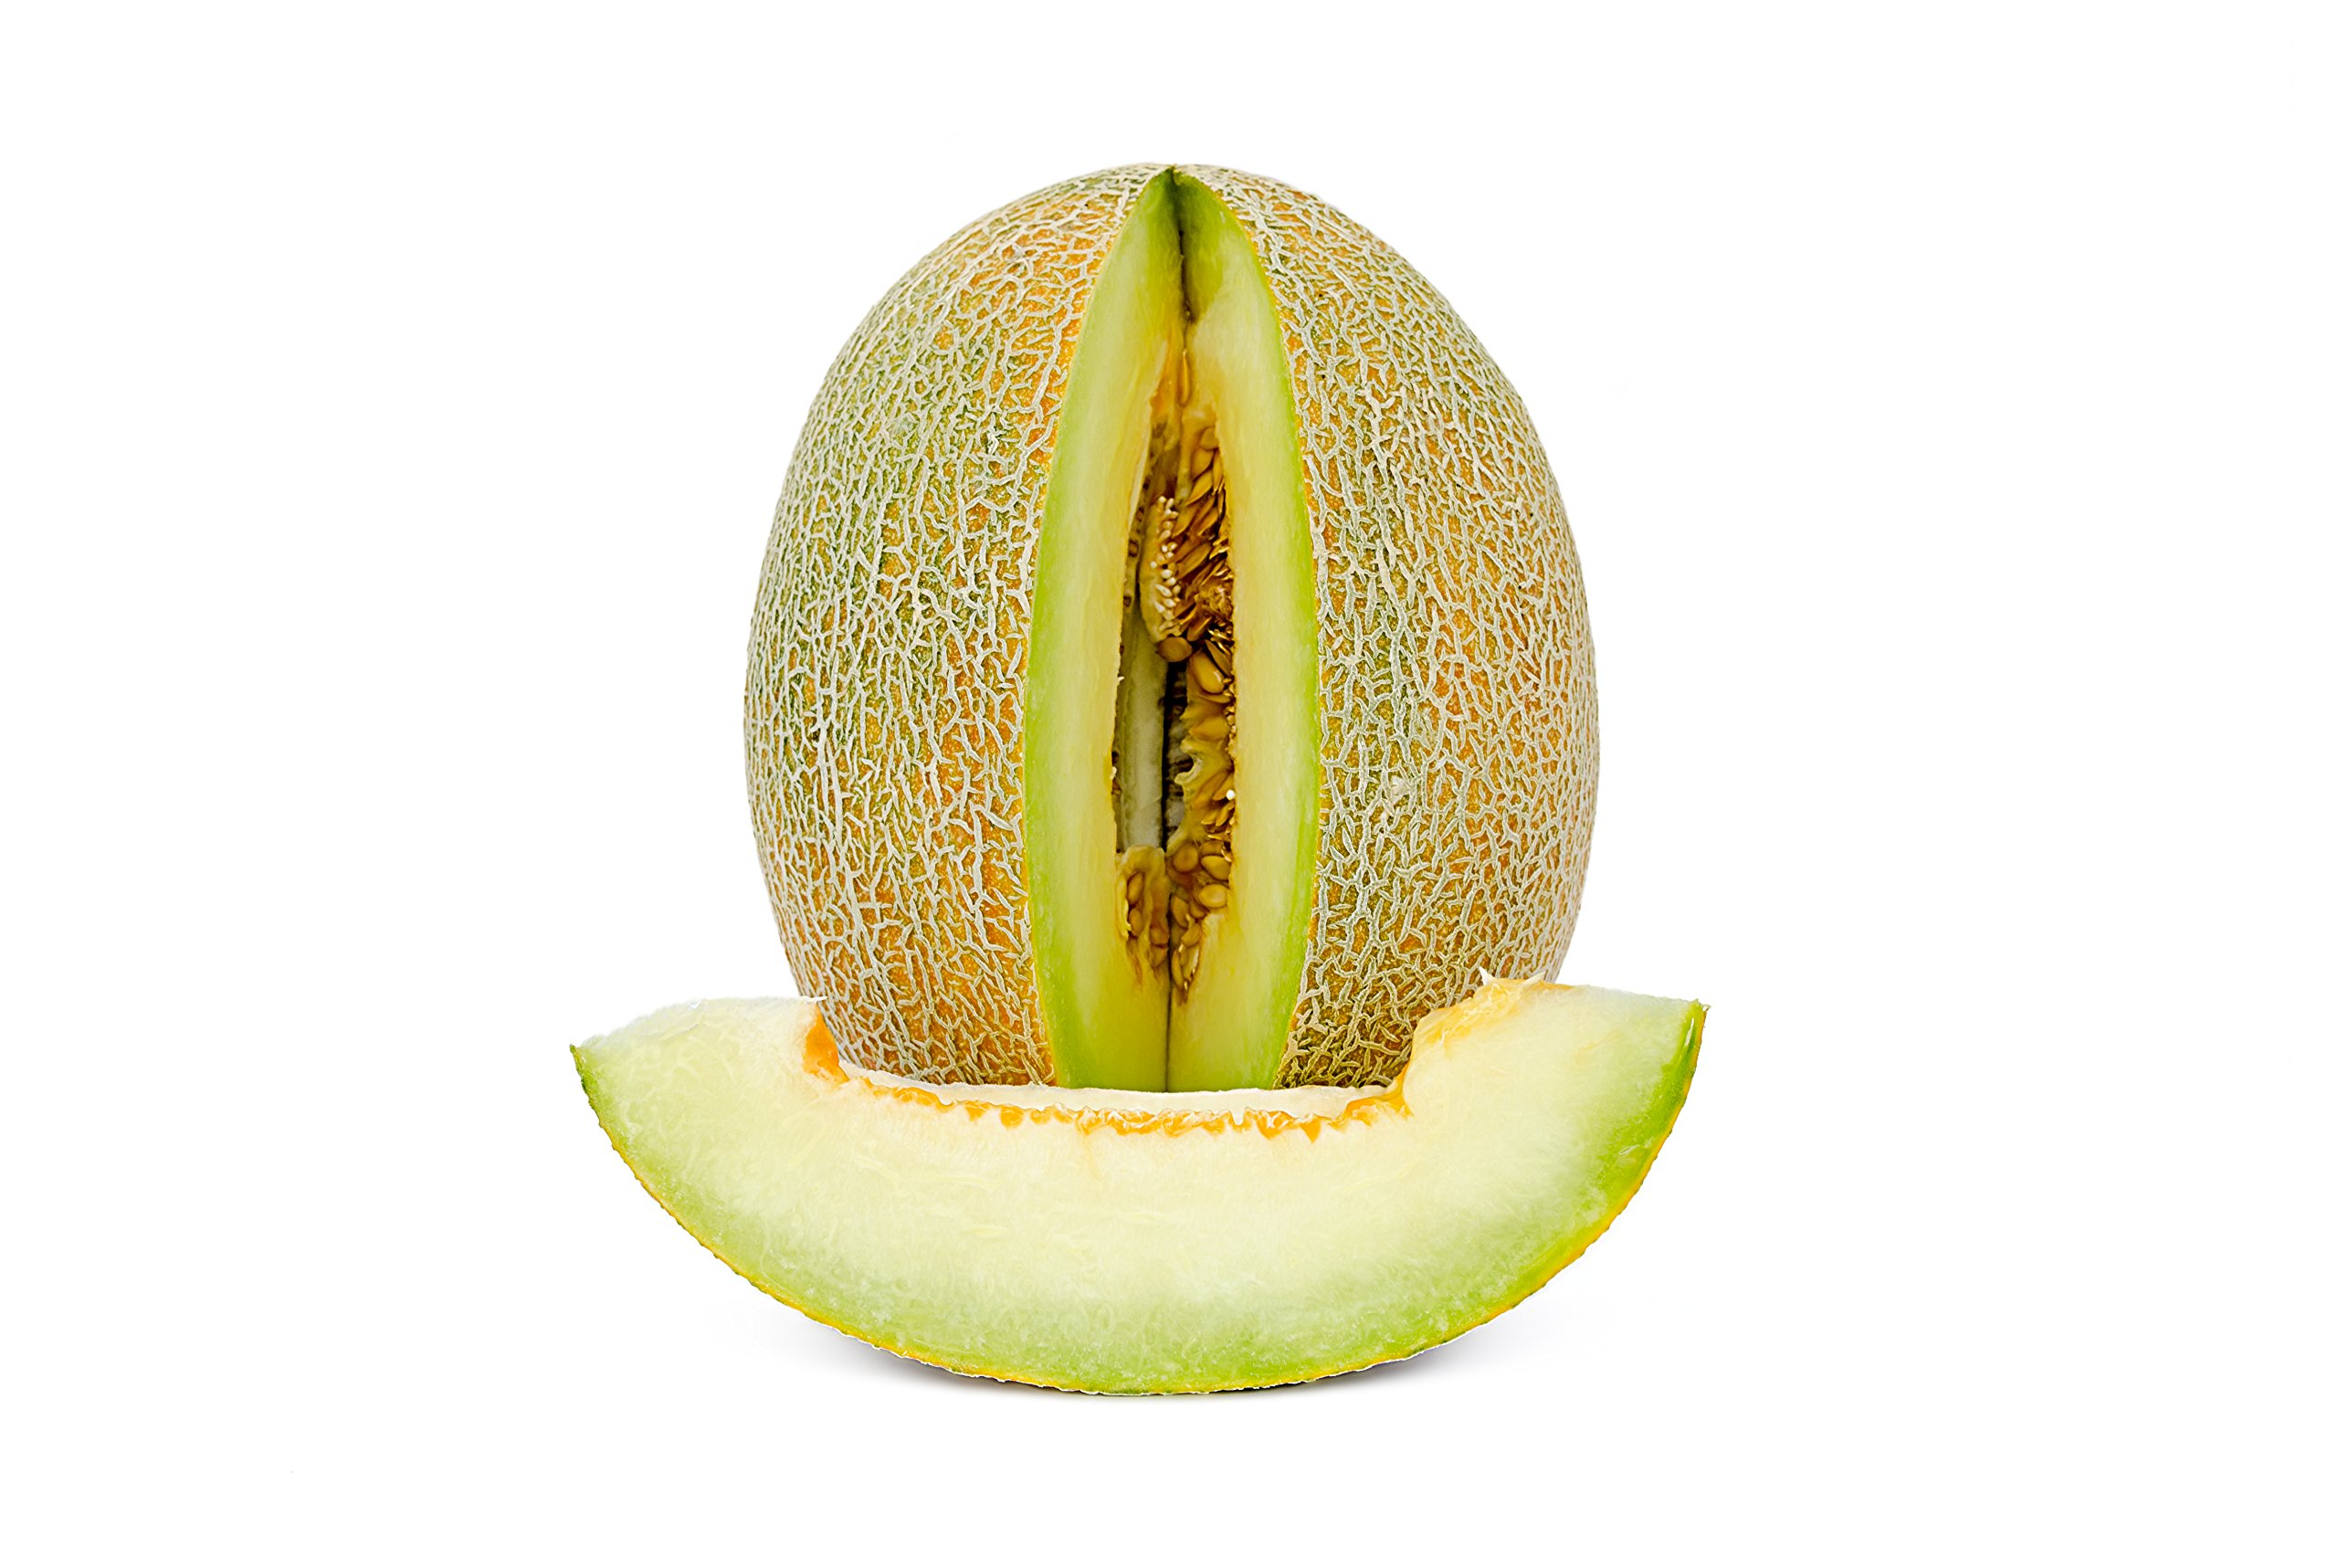 Heirloom Fruit Seeds- Non Hybrid- Real Survival Seeds. Honeydew Green Melon, Banana Melon, Honey Rock Cantaloupe, Watermelon Crimson Sweet, Sugar Baby Watermelon Seeds, Hales Best Jumbo Melon,Non GMO by Heirloom Fruit Seeds (Image #7)